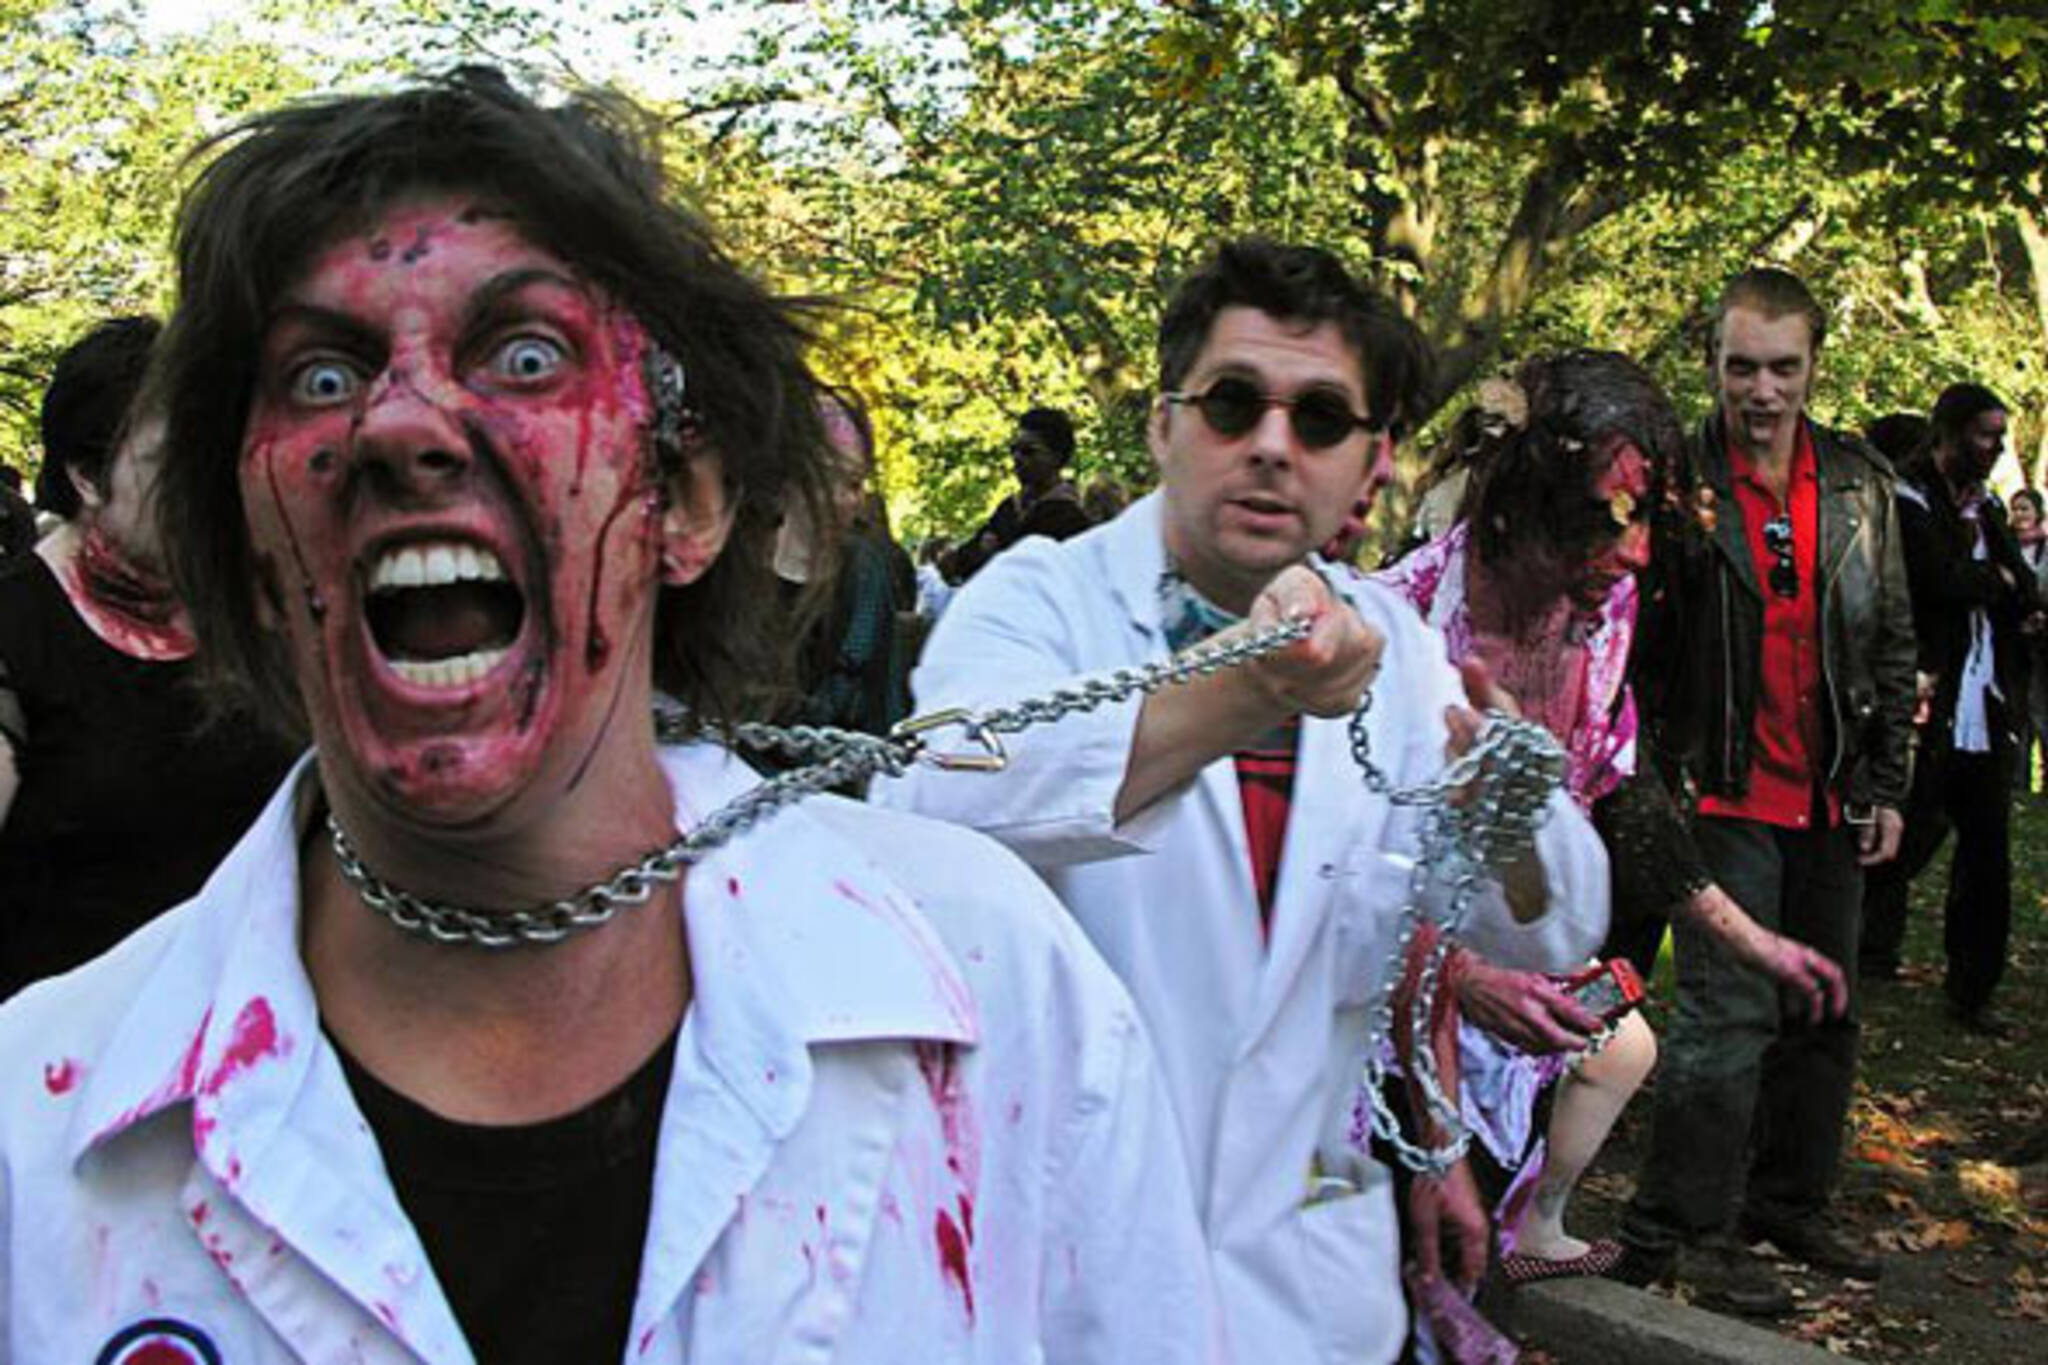 20081020_zombiewalk.jpg